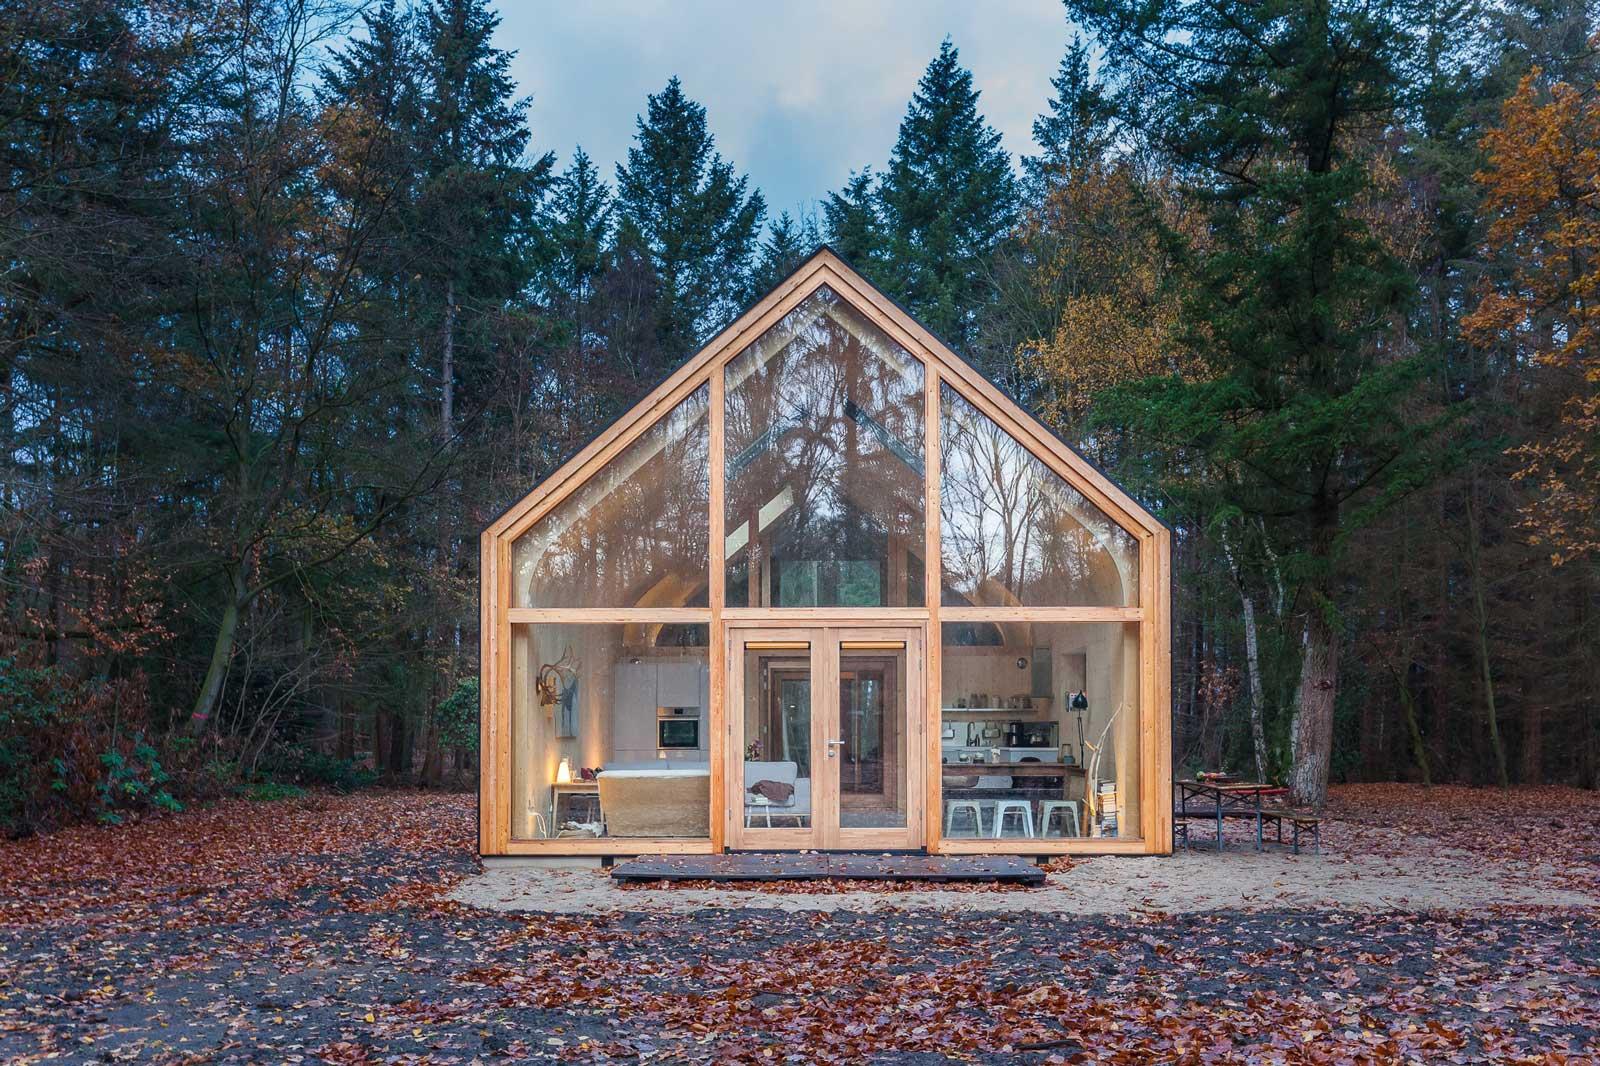 Betonstuc-vloer-in-houtskeletbouw-woning-Barchem-10-1